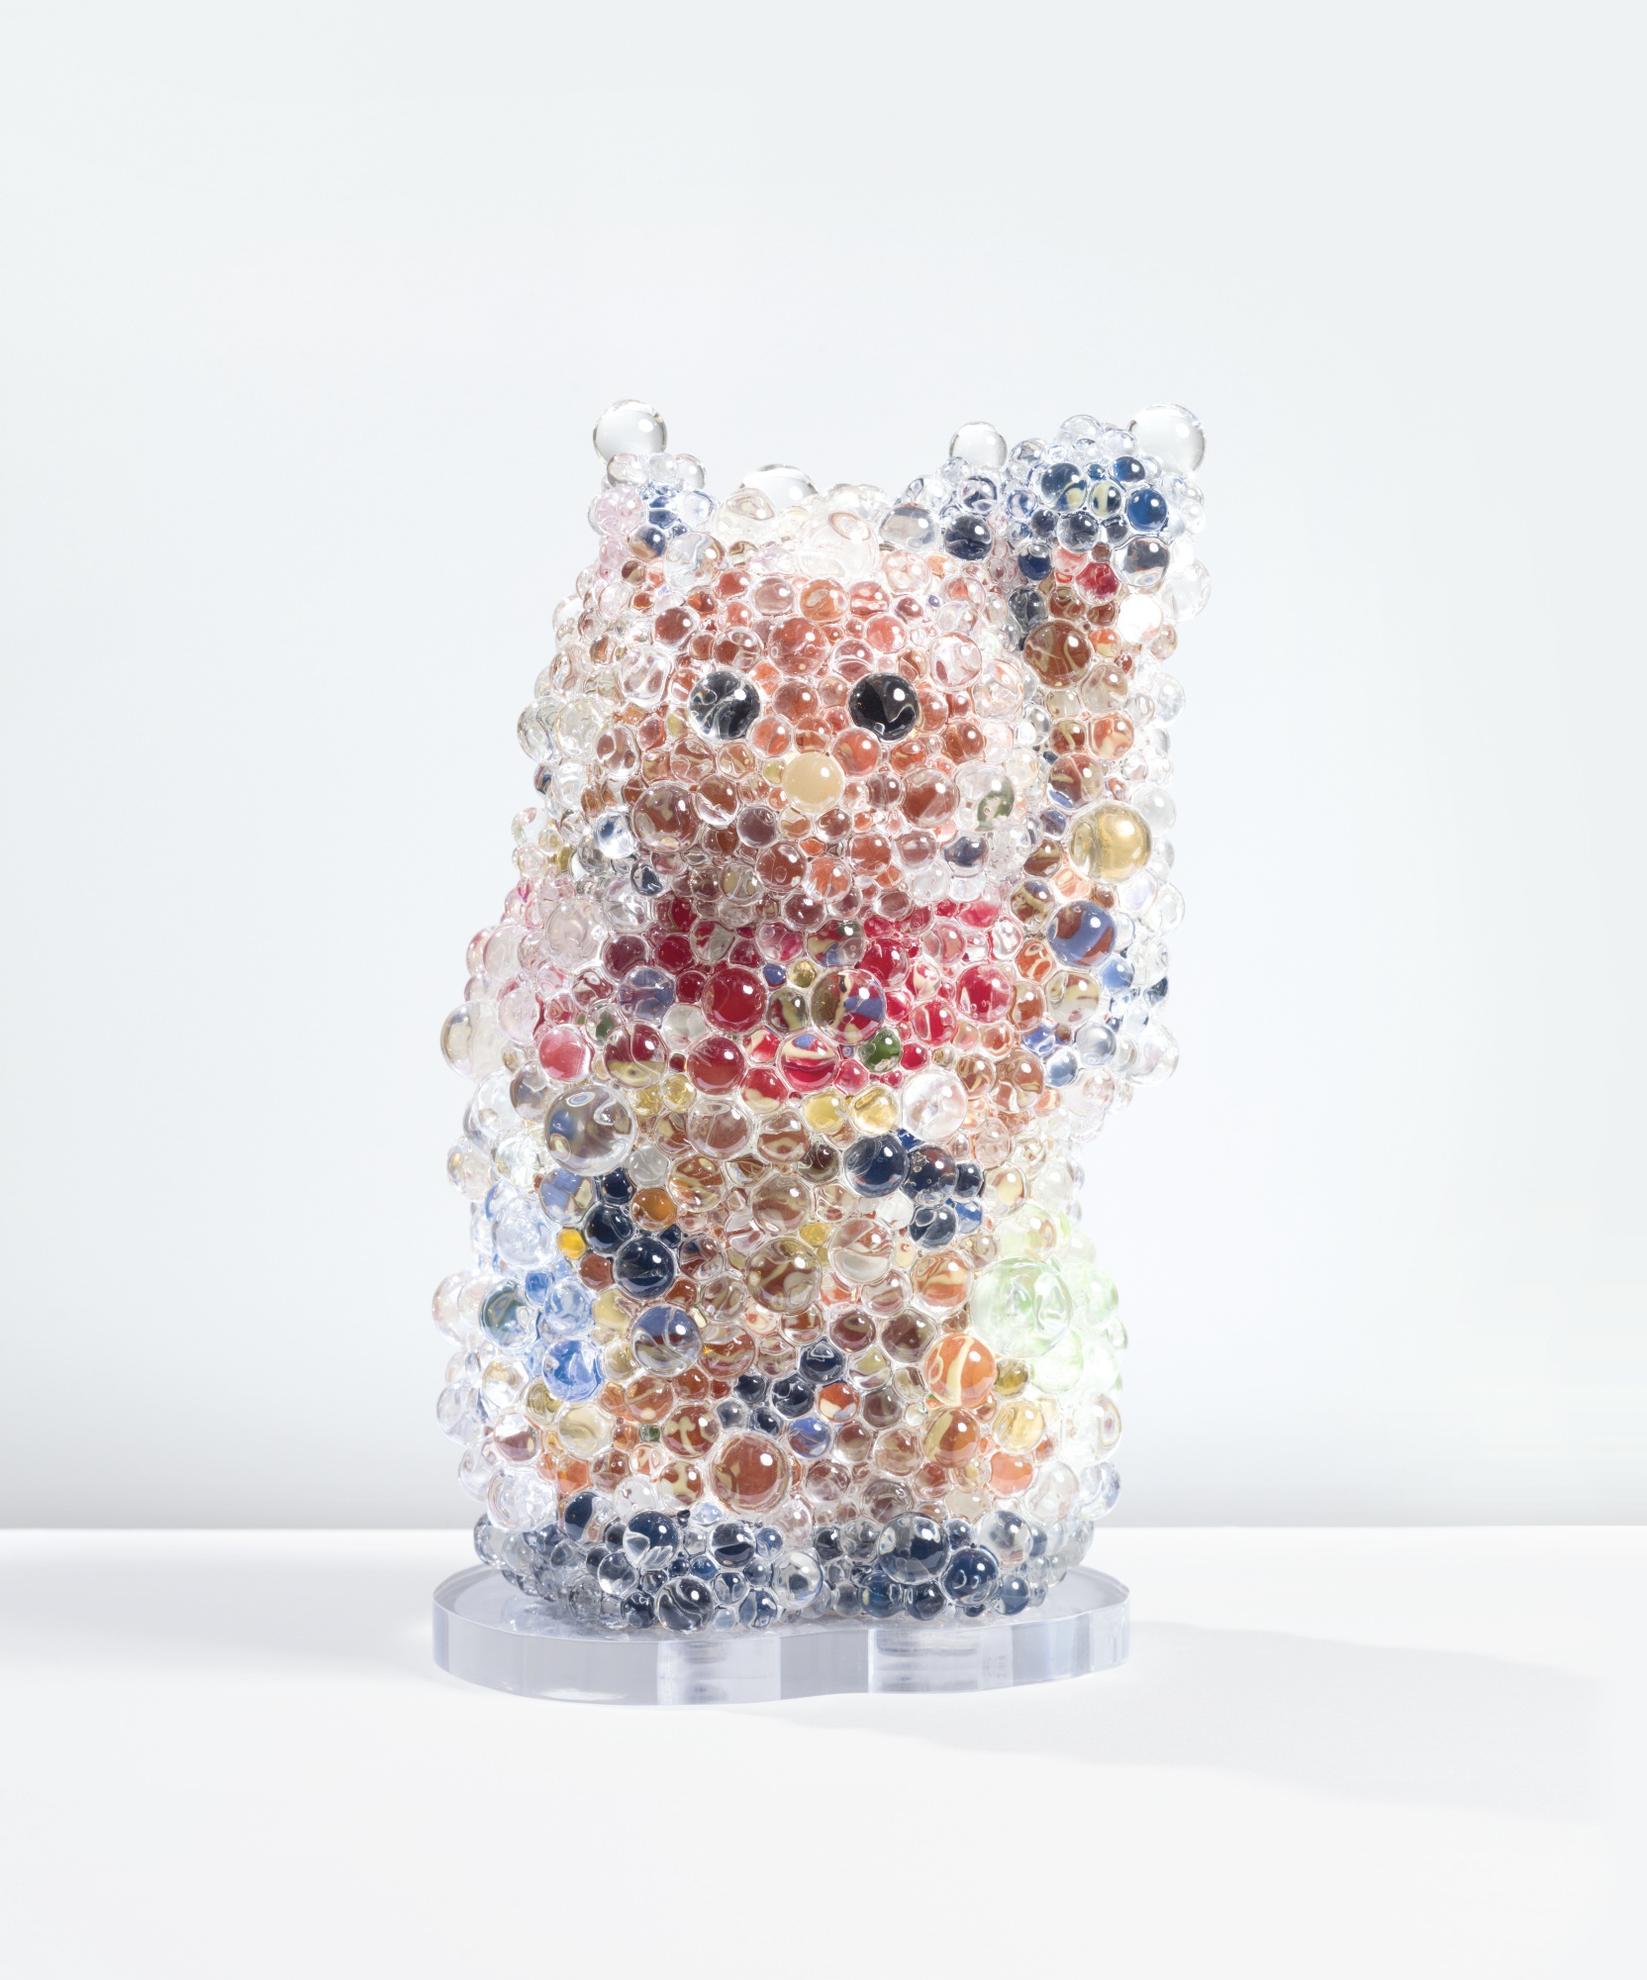 Kohei Nawa-Pixcell - Beckoning Cat-2015